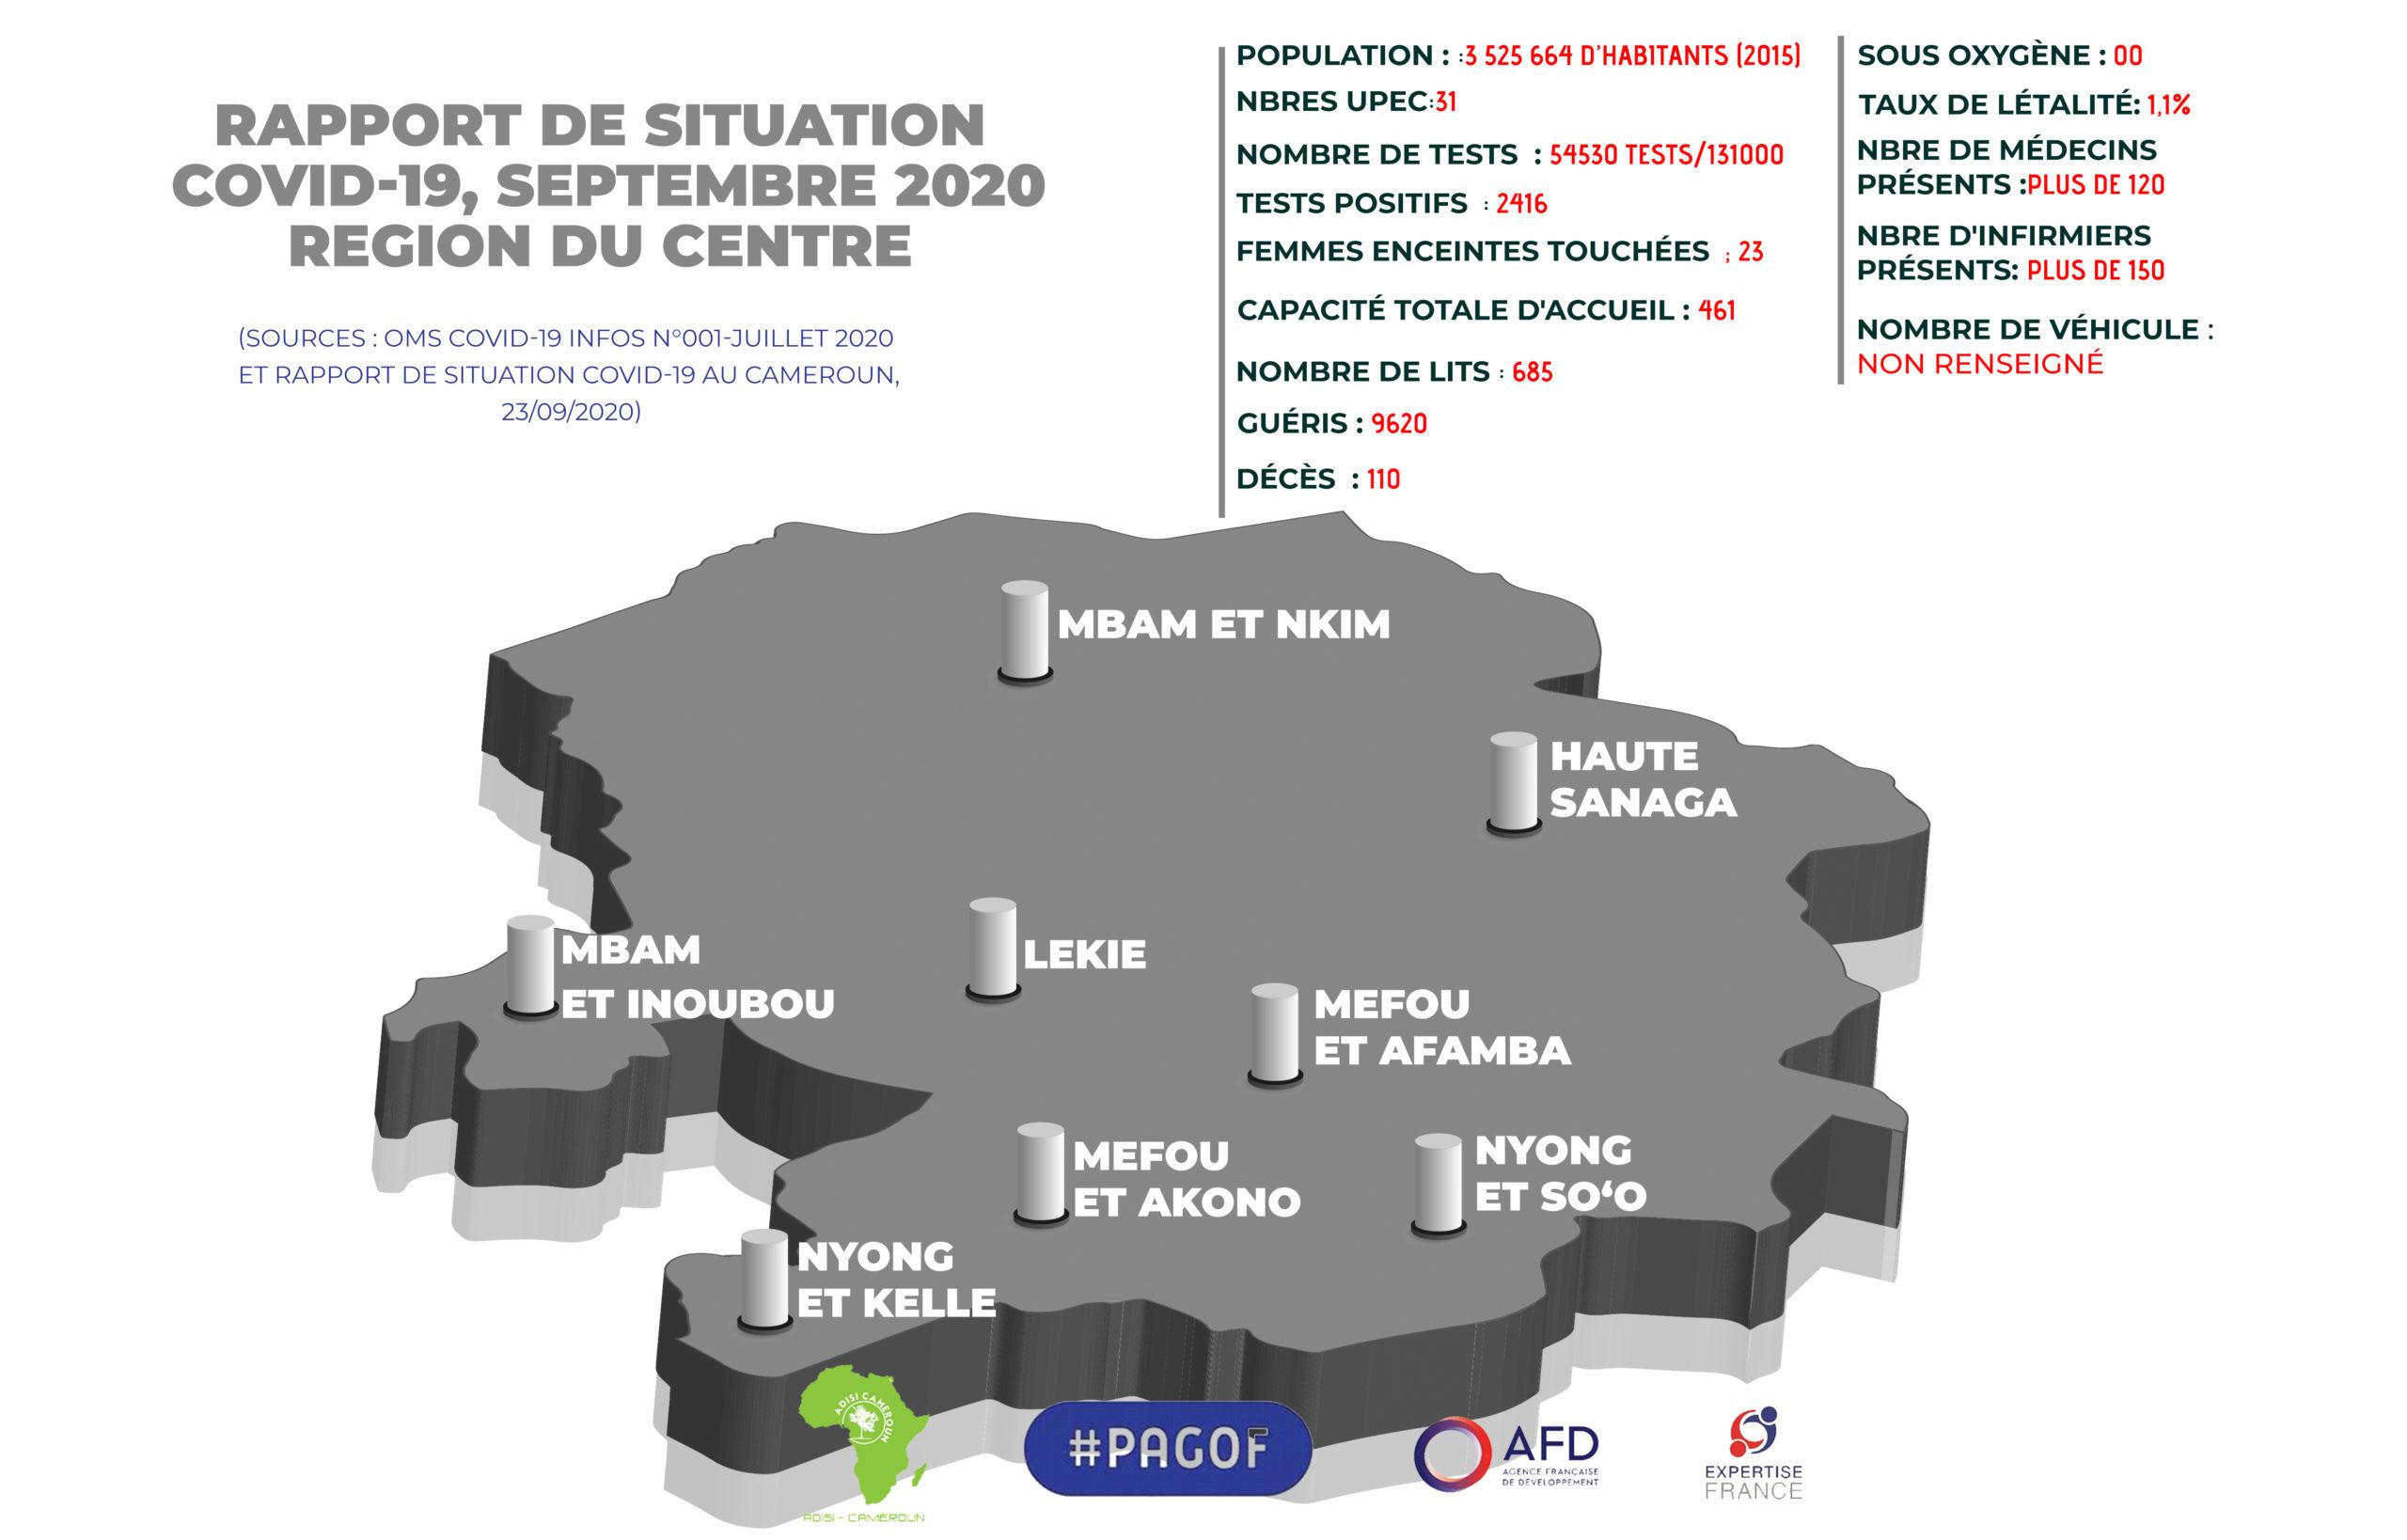 COVID-19 : Le Mfoundi rafle les ressources de lutte contre la Covid-19 dans le Centre